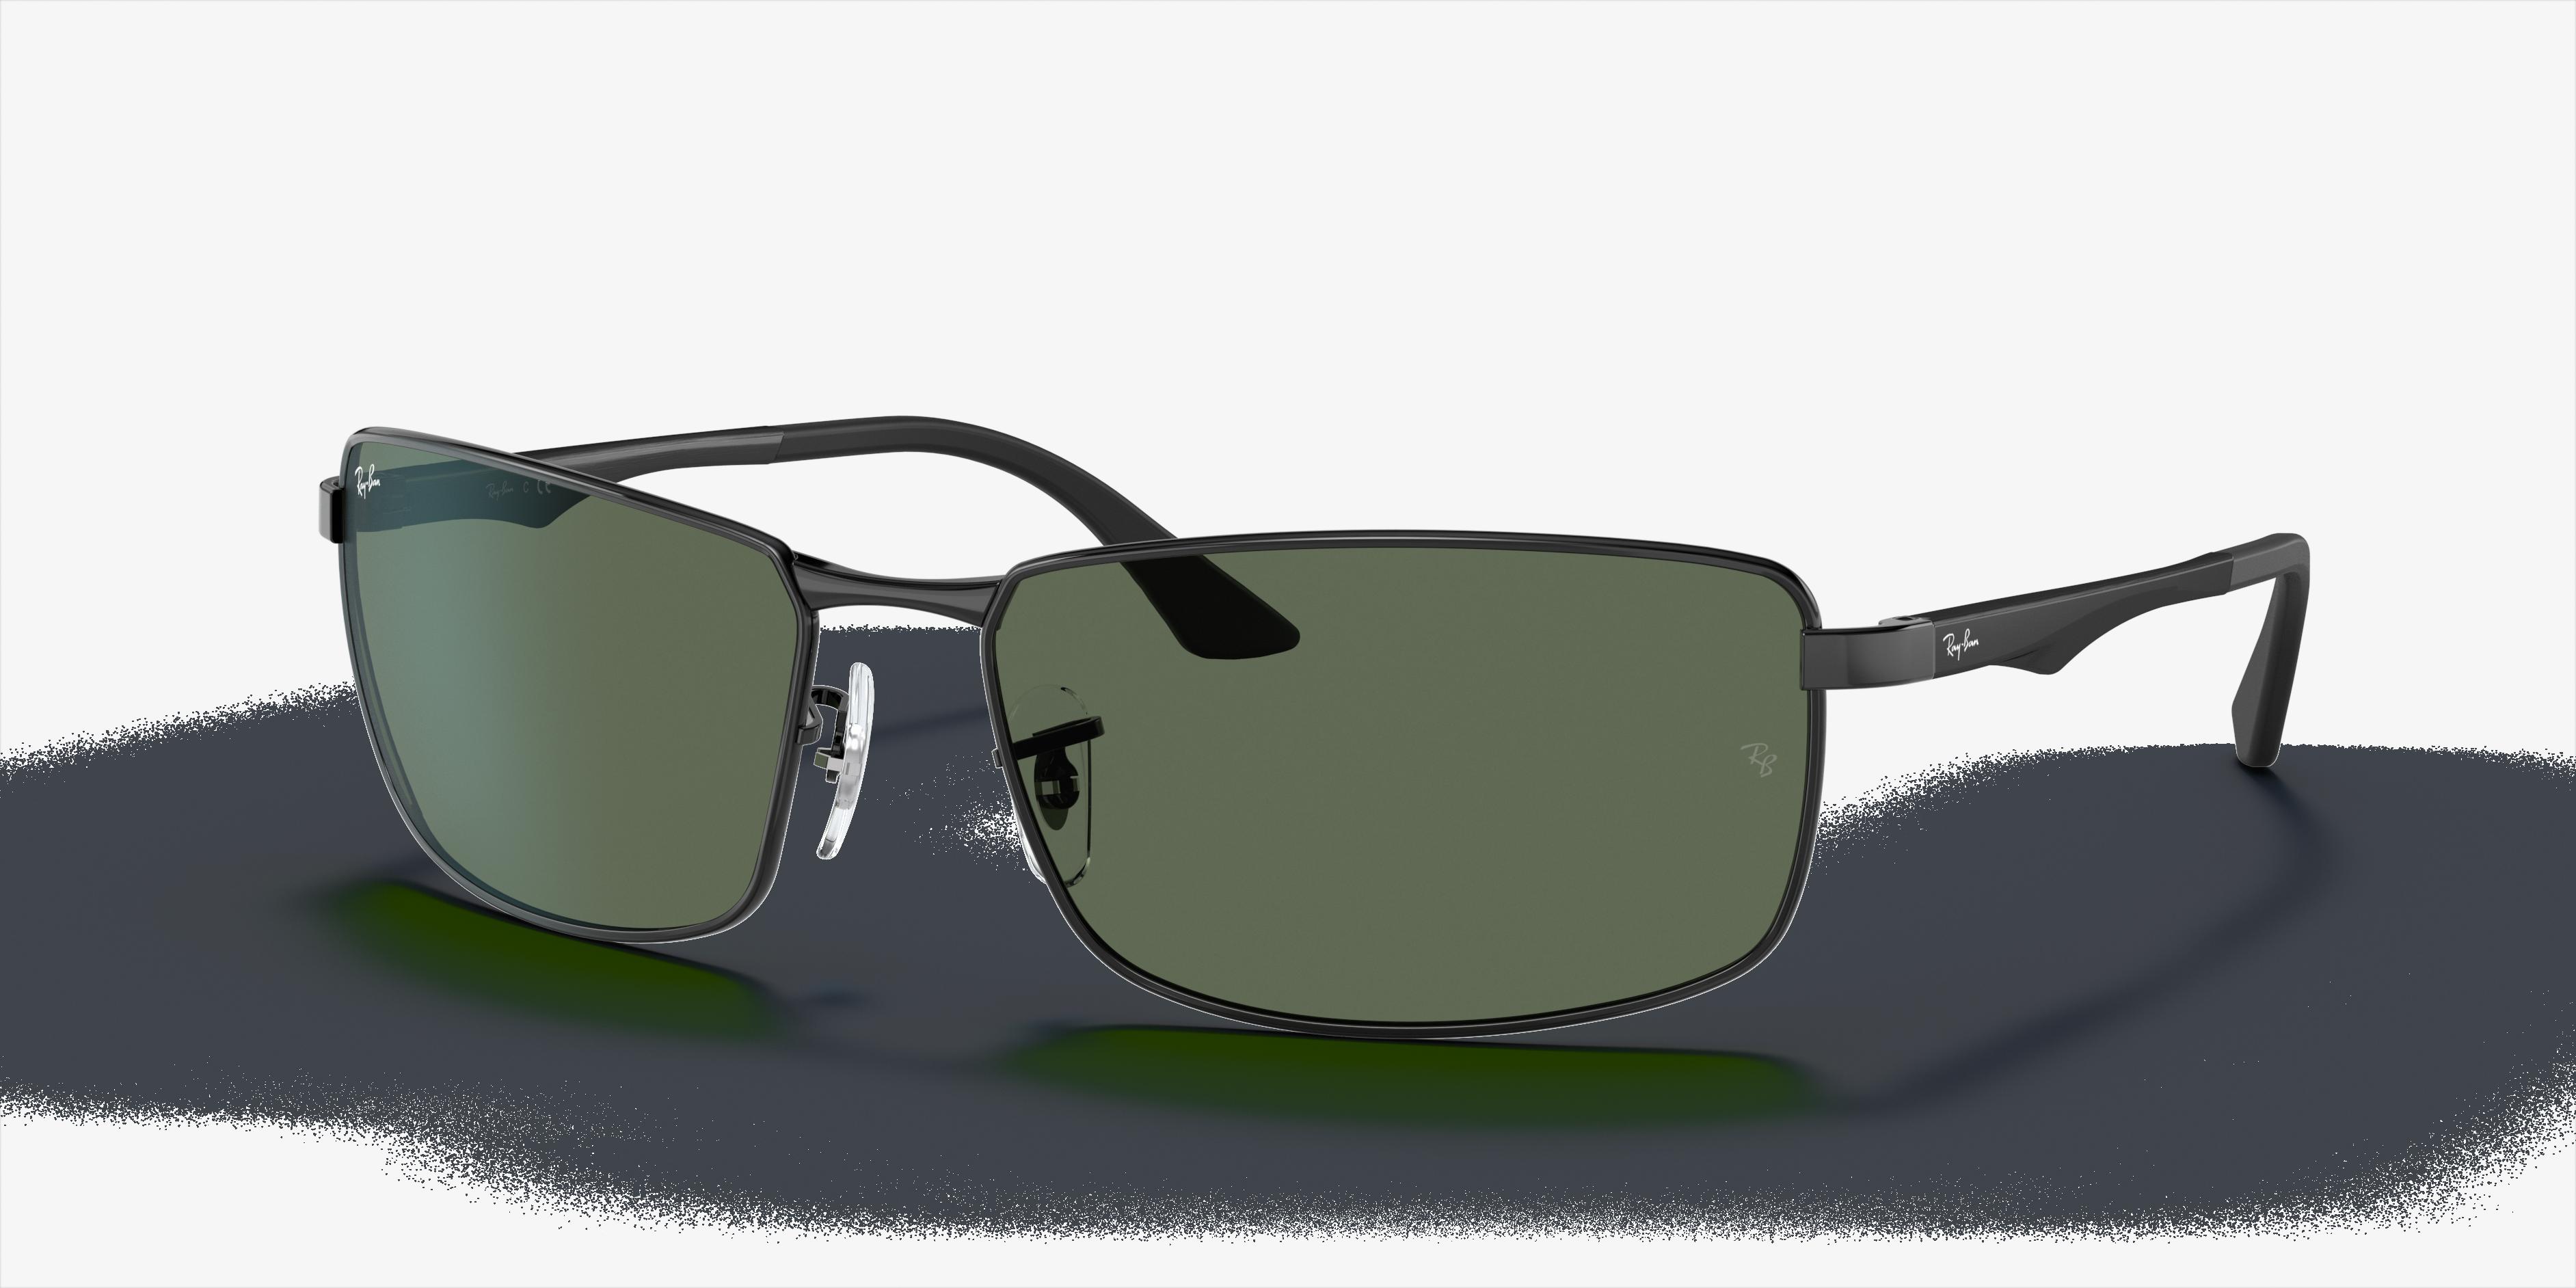 Ray-Ban Rb3498 Black, Green Lenses - RB3498